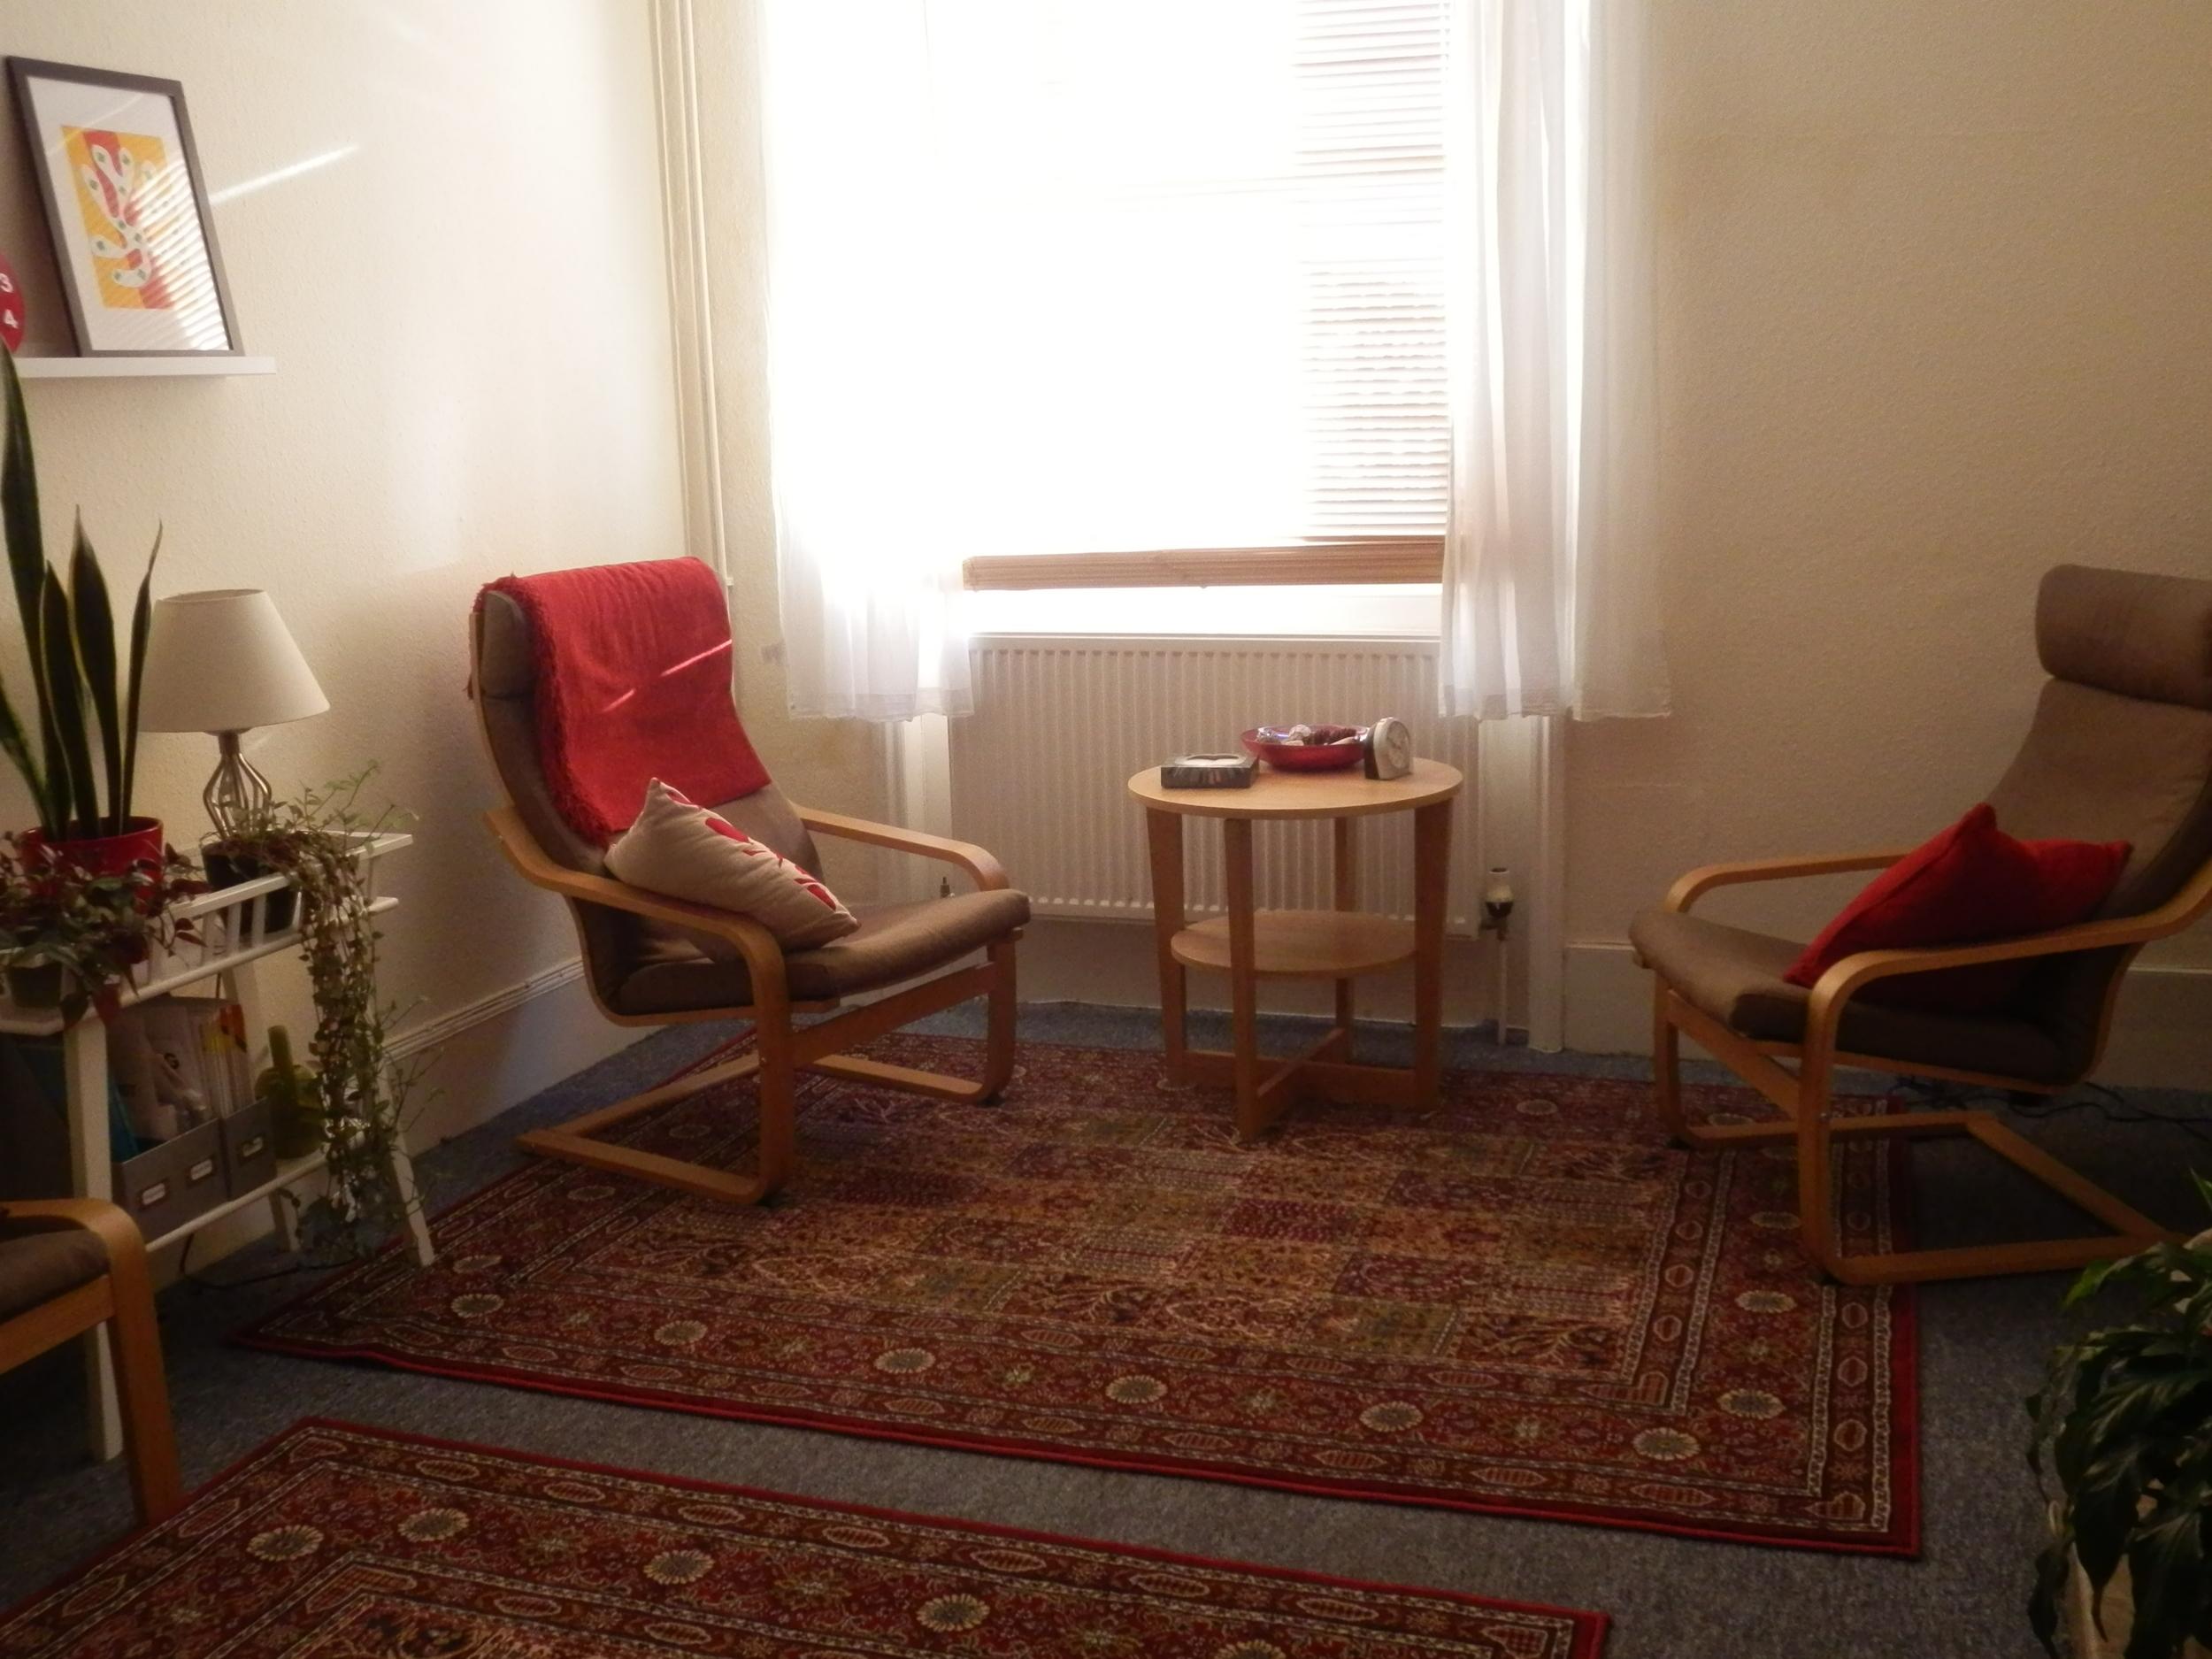 psychotherapy room brighton.JPG